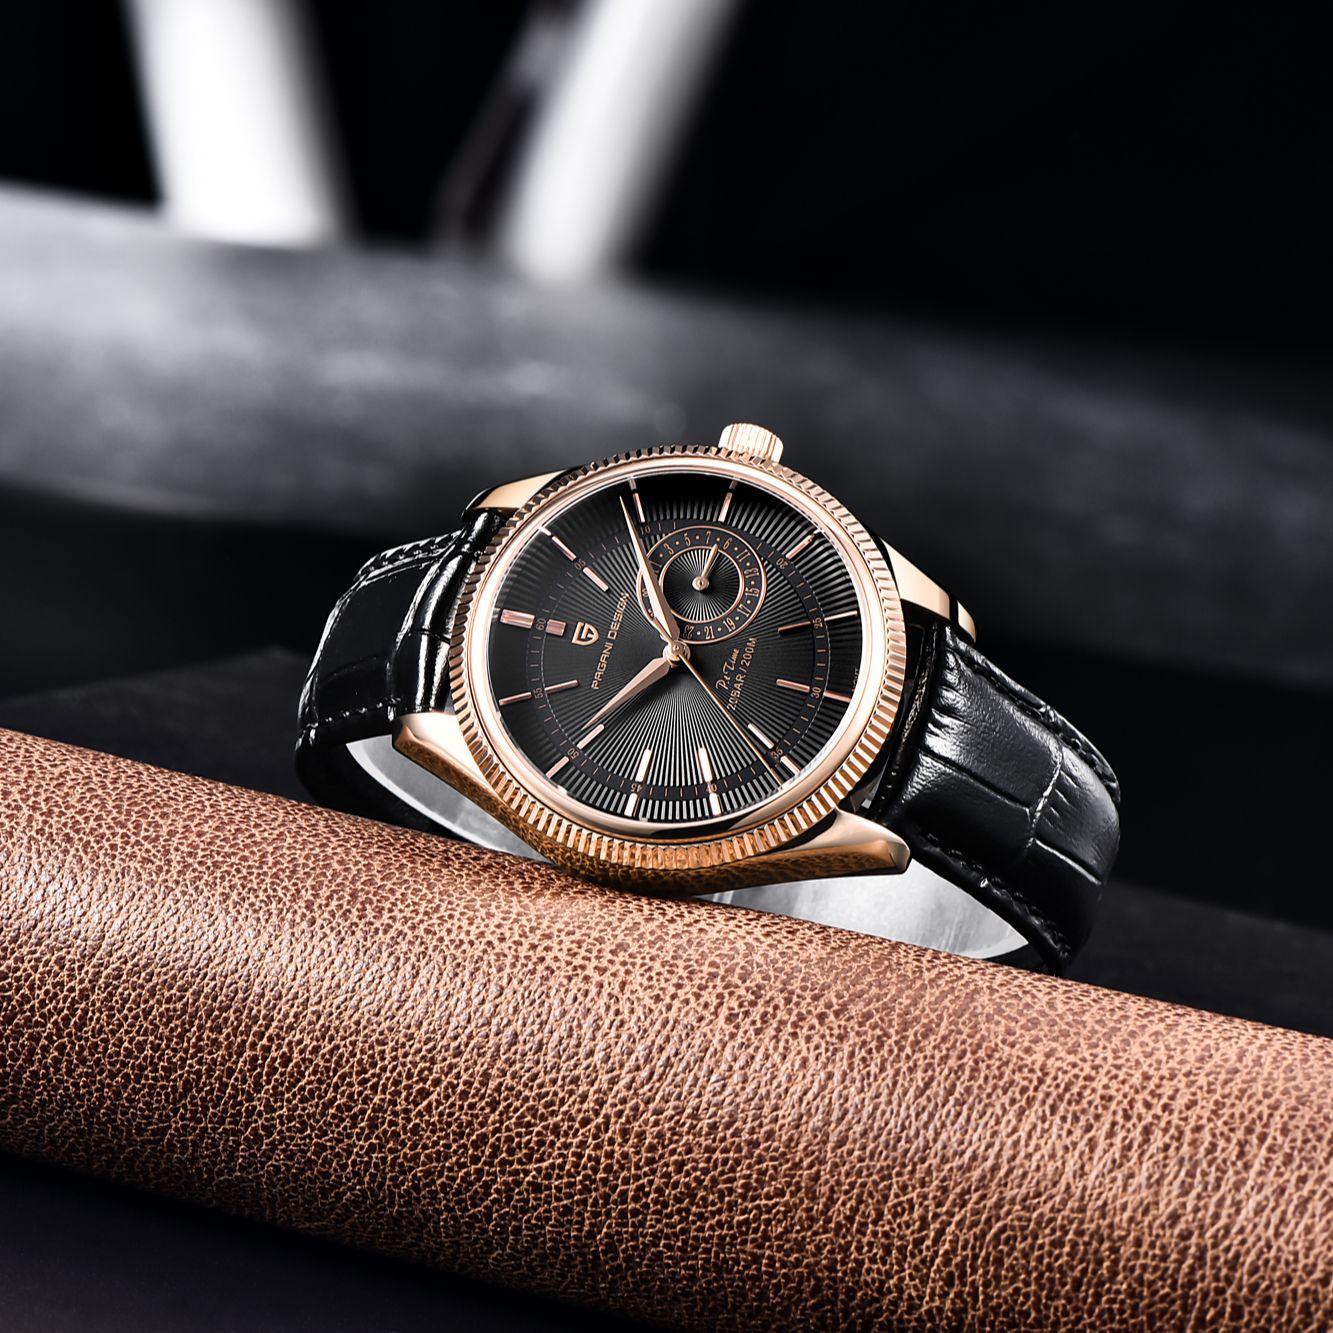 Pagani Design 2021 New Men Quartz Watch Top Brand Watches 200m Automatic Waterproof Clock Luxury Leather Watch Relogio Masculino enlarge